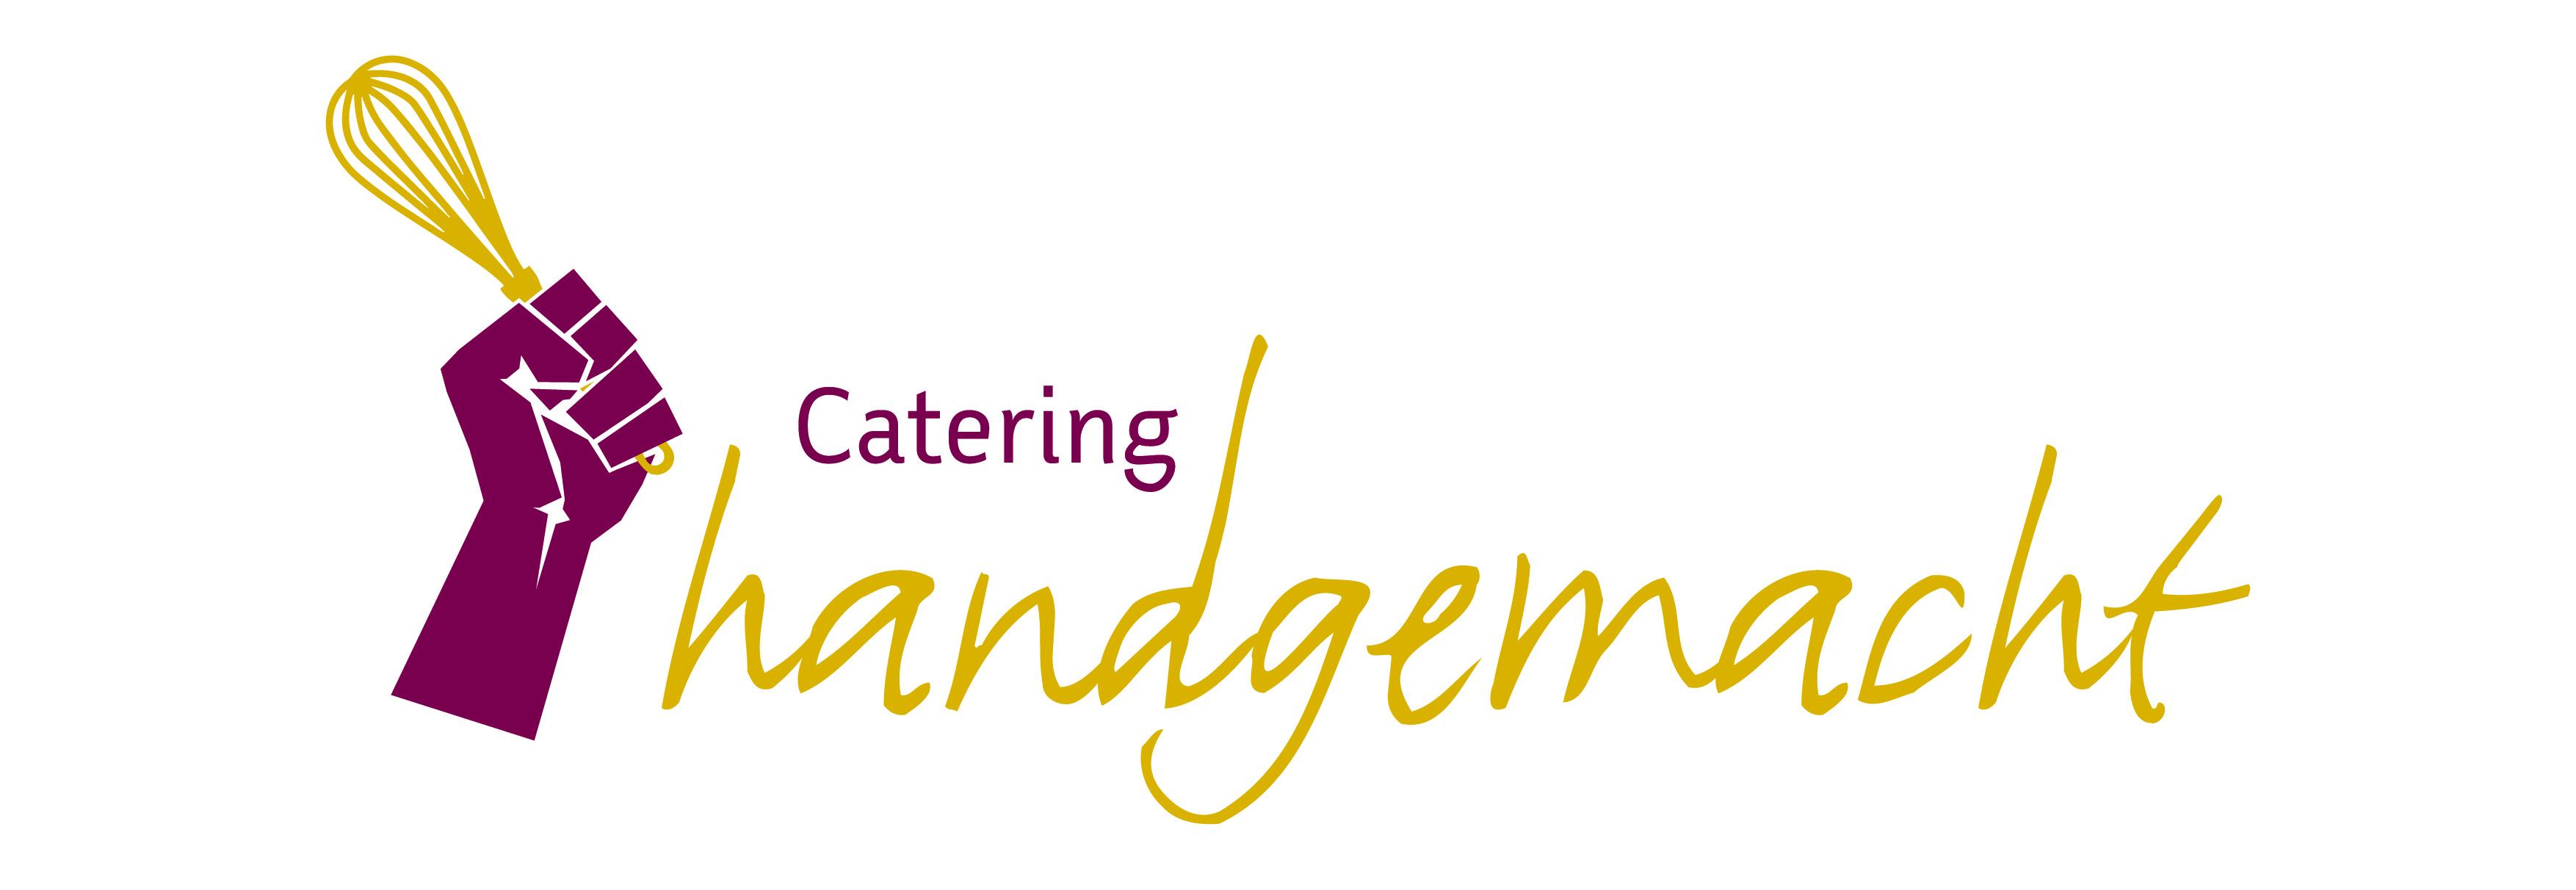 Handgemacht Catering